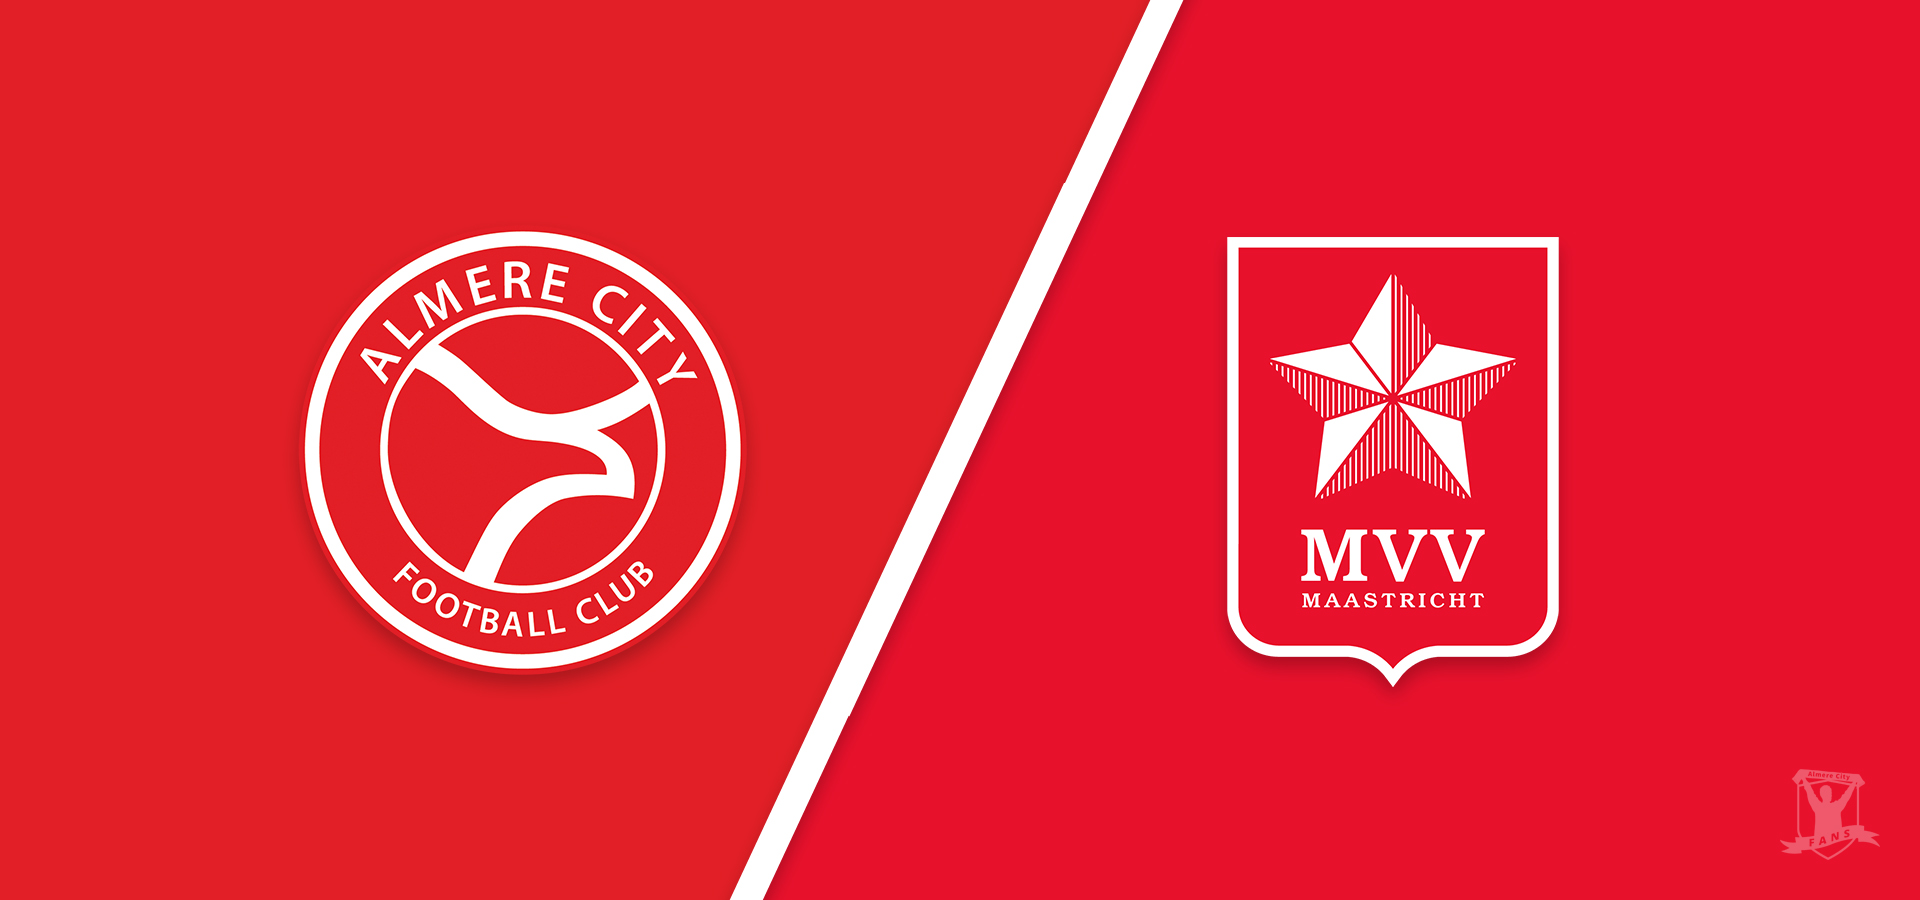 Voorbeschouwing: Almere City FC trapt seizoen 20/21 af tegen MVV Maastricht